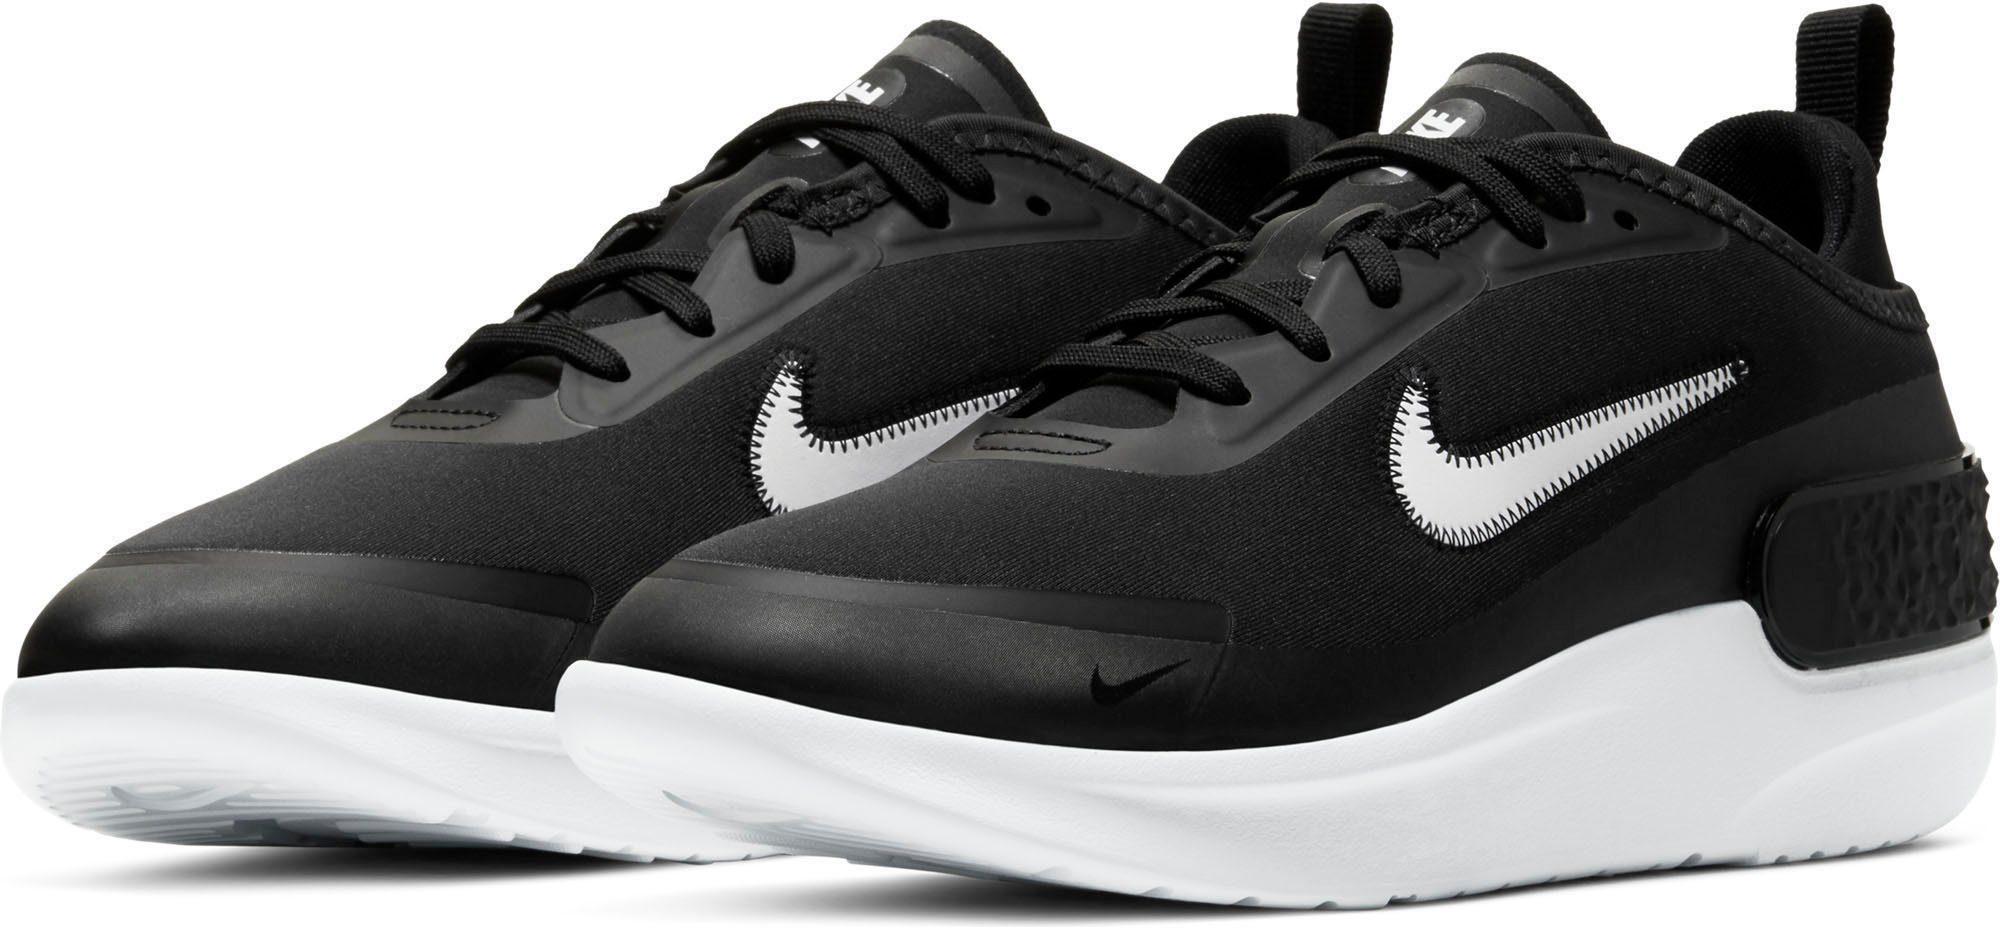 Nike Sportswear »Wmns Amixa« Sneaker, Atmungsaktives Obermaterial aus Synthetik und Textil online kaufen | OTTO